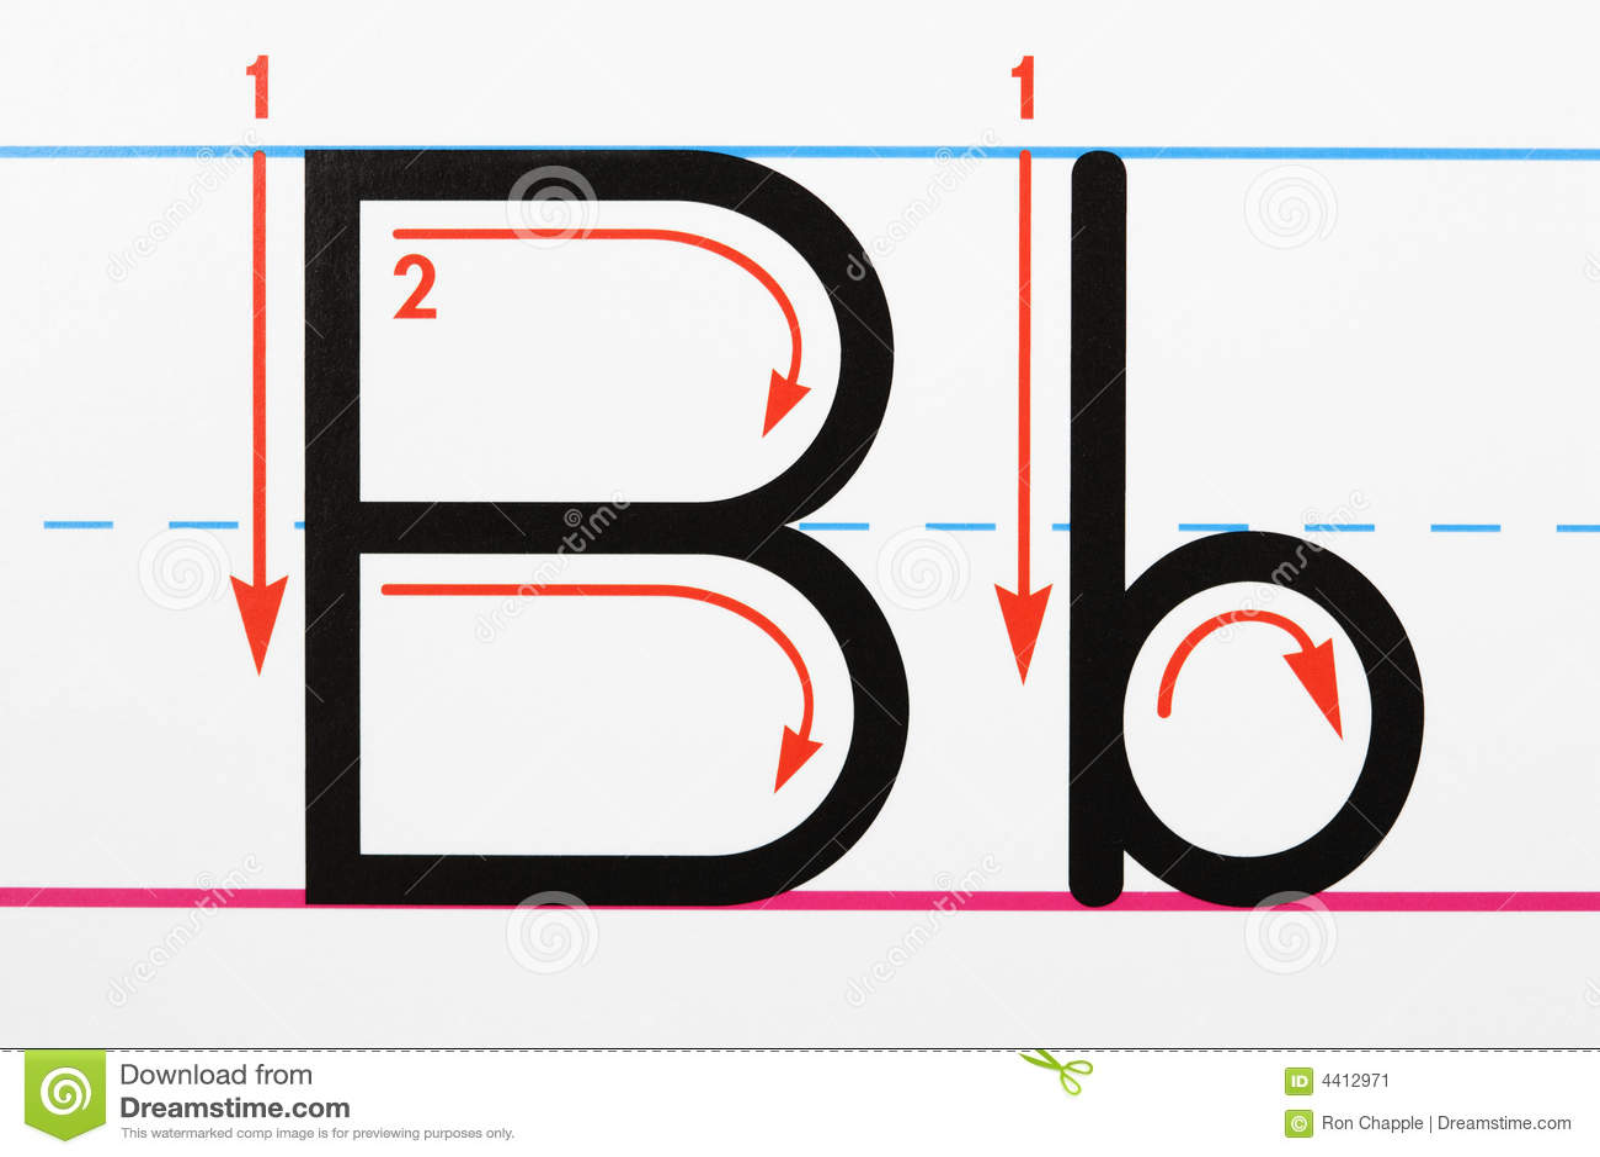 Letter B Handwriting Stock Image Image Of Language Conceptual